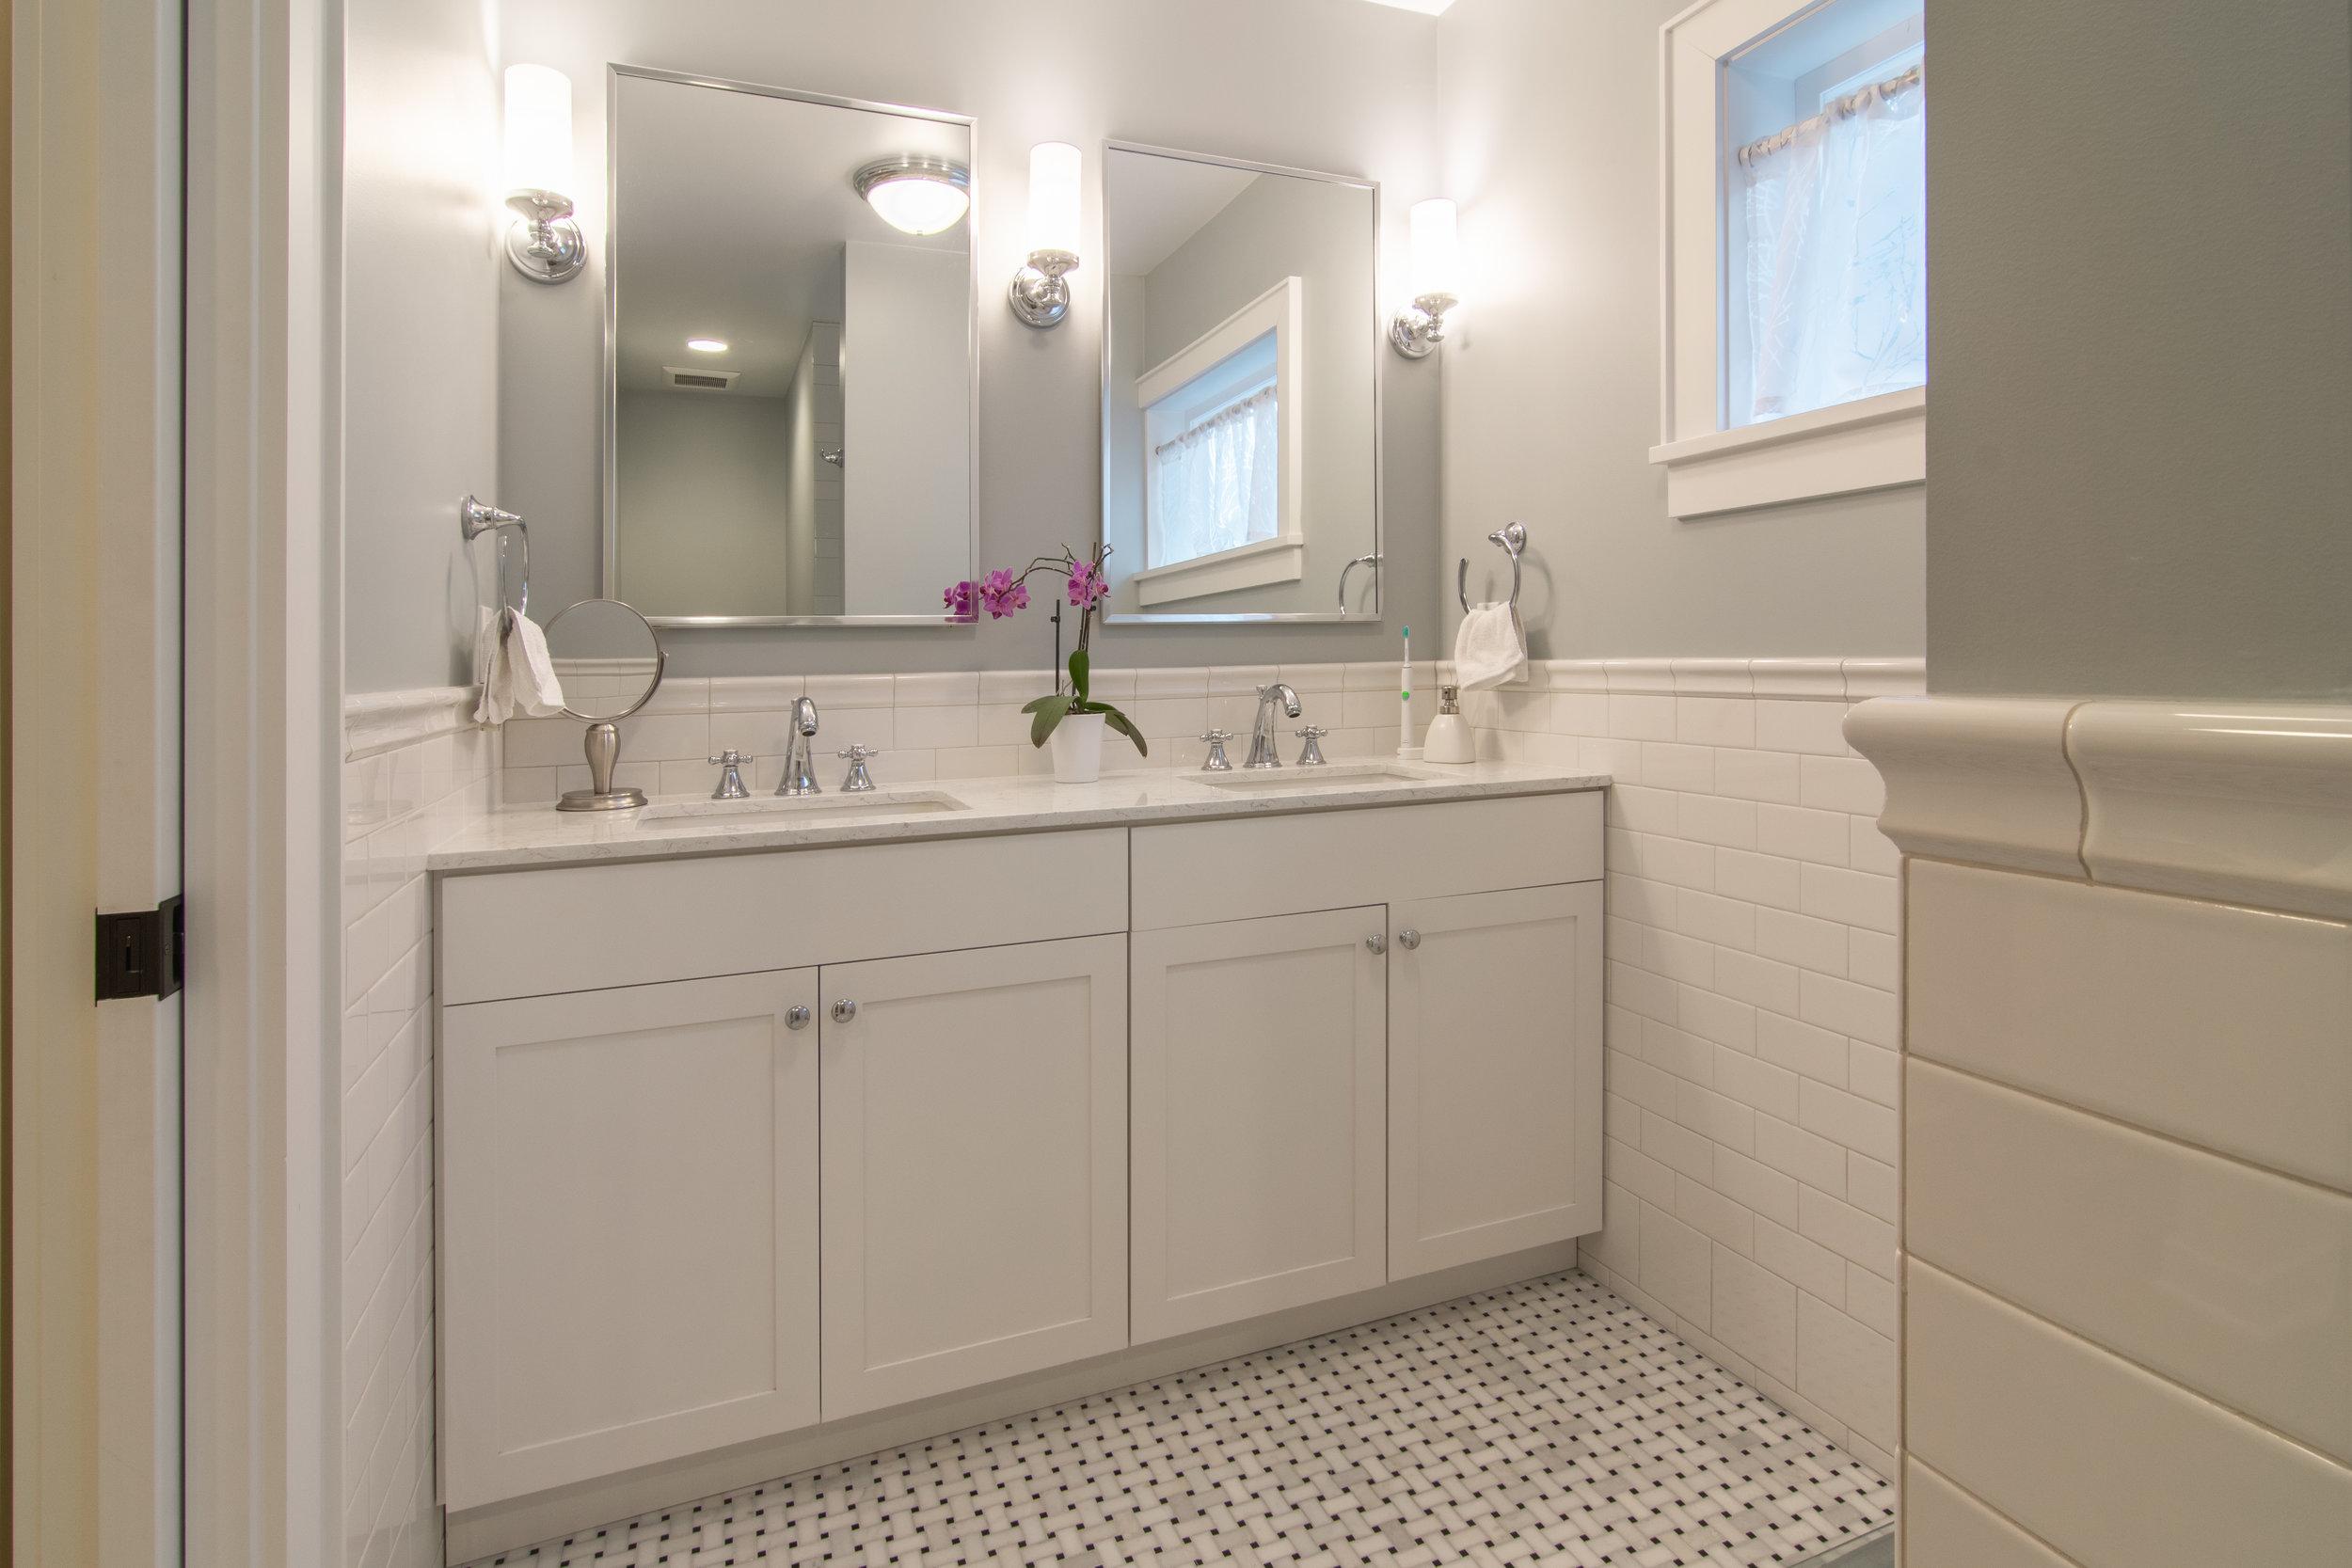 18 - Queen Anne Victorian bathroom vanity.jpg